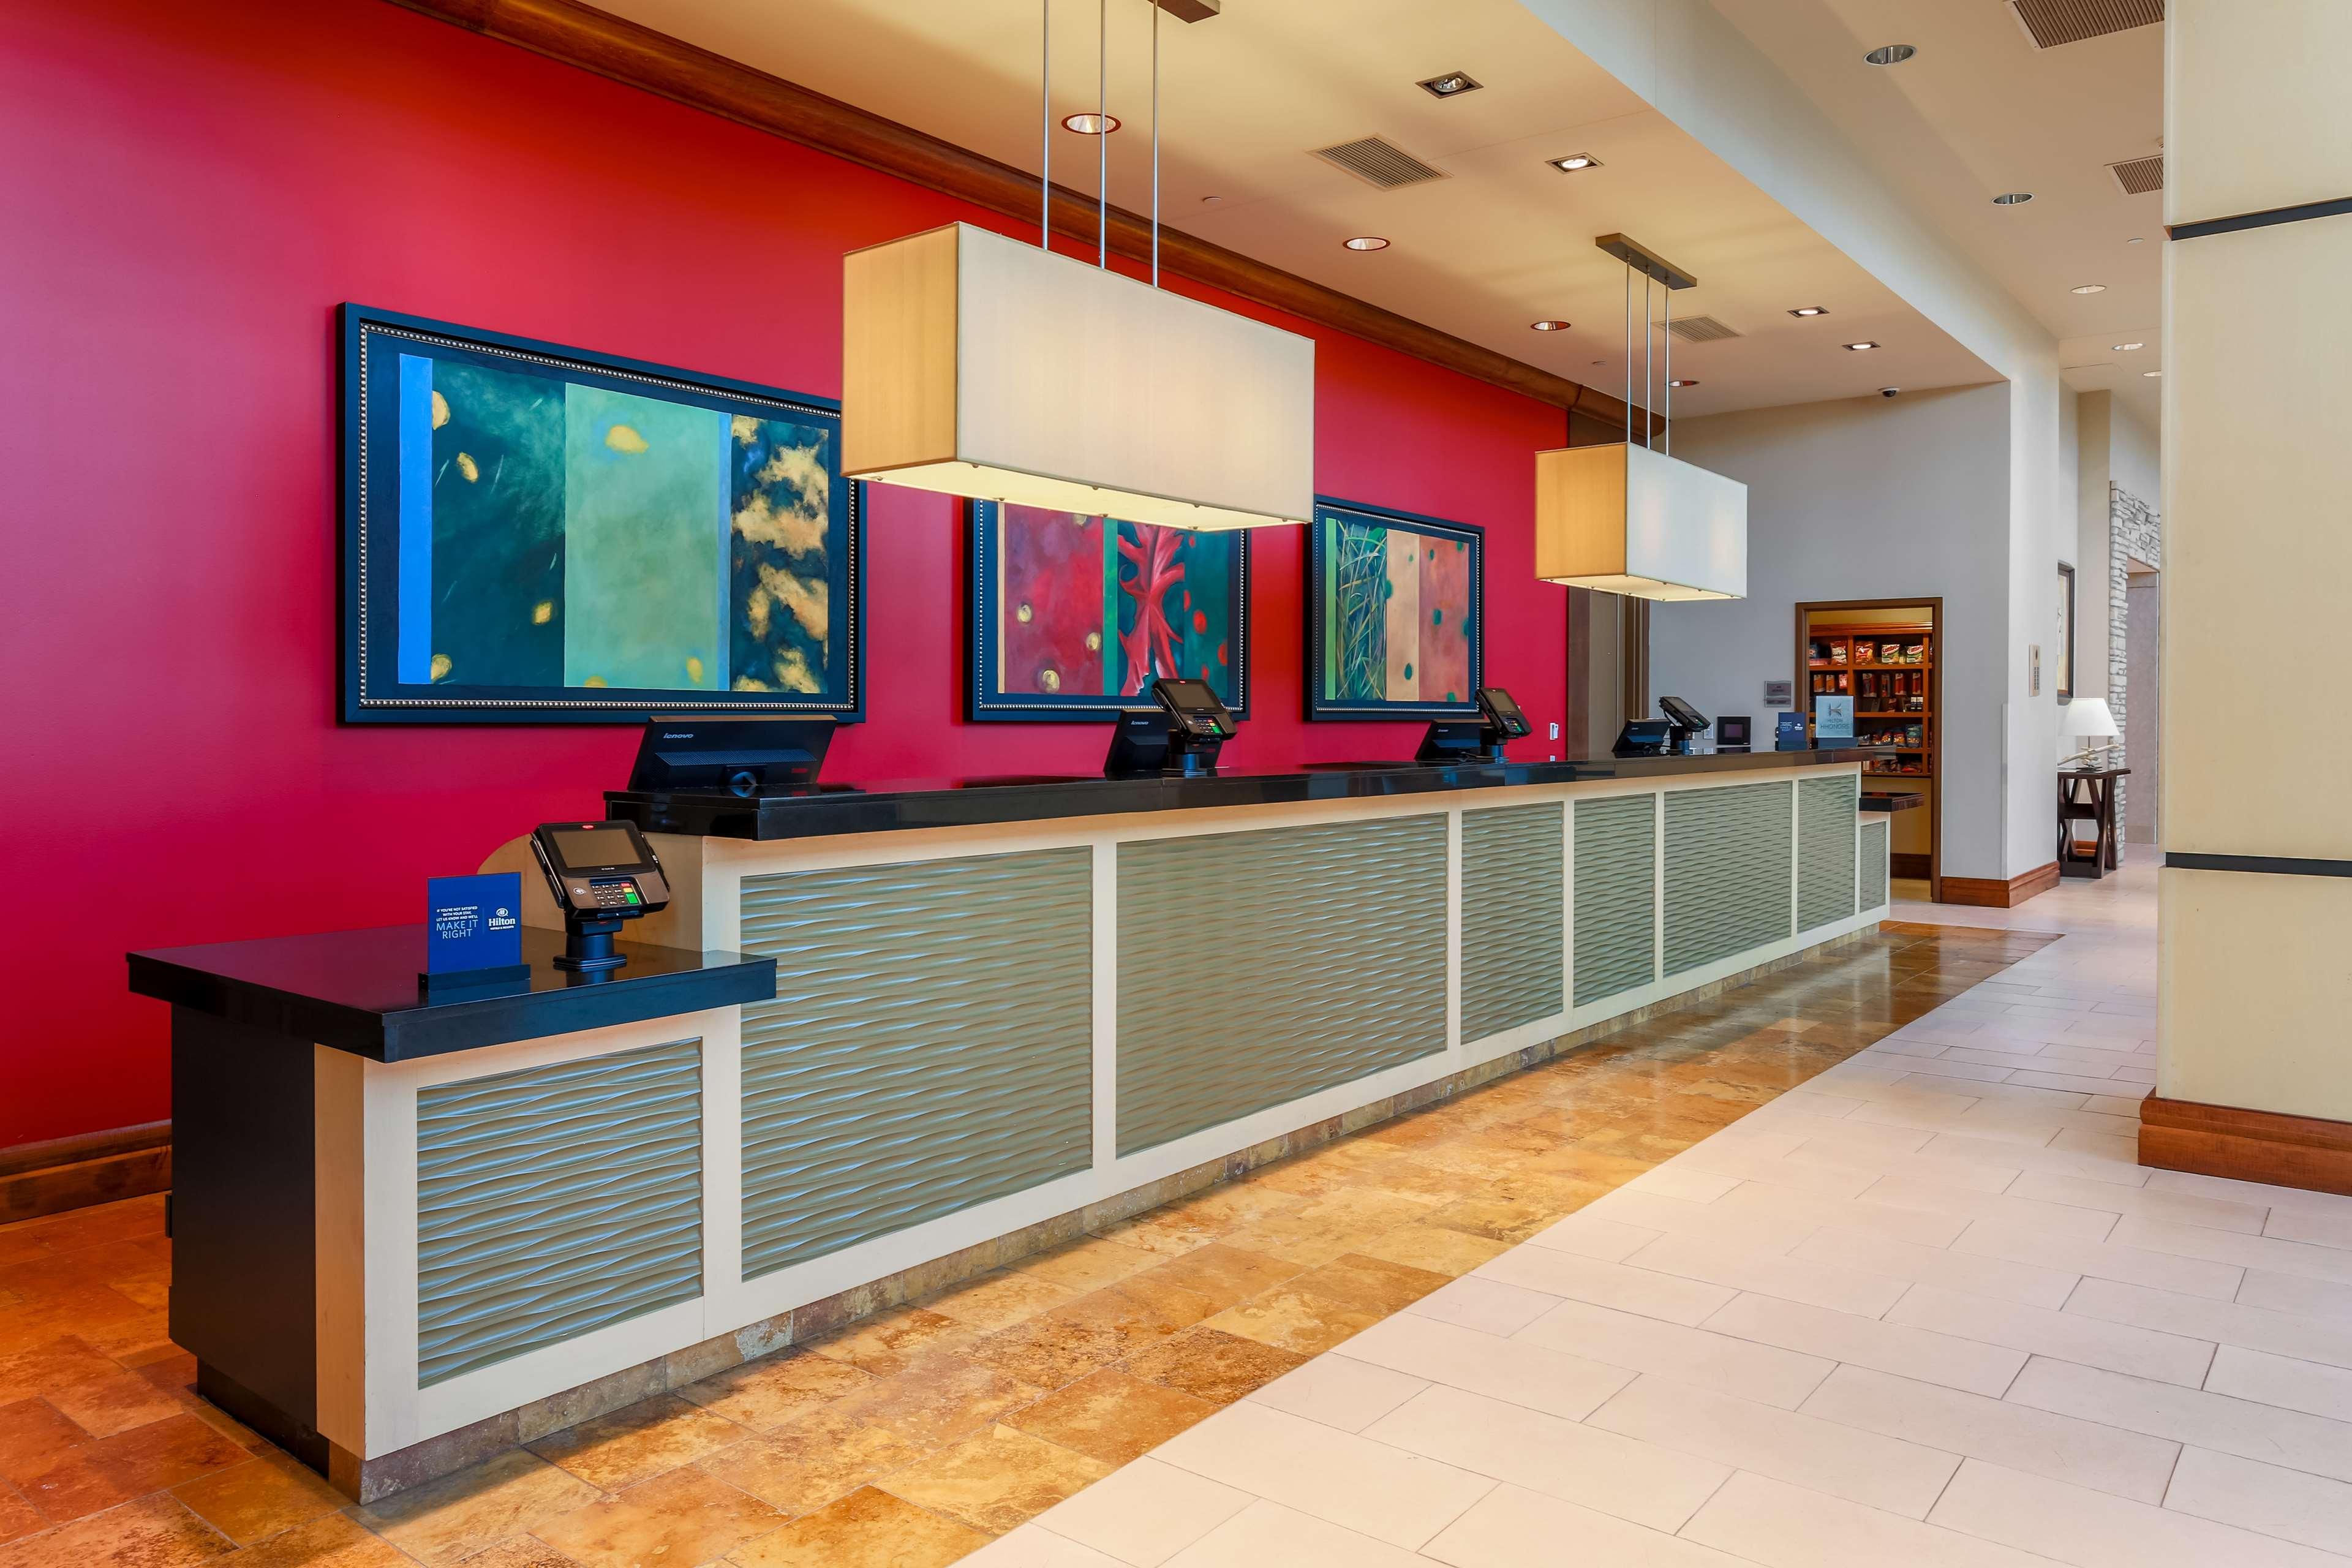 Hilton Branson Convention Center image 4